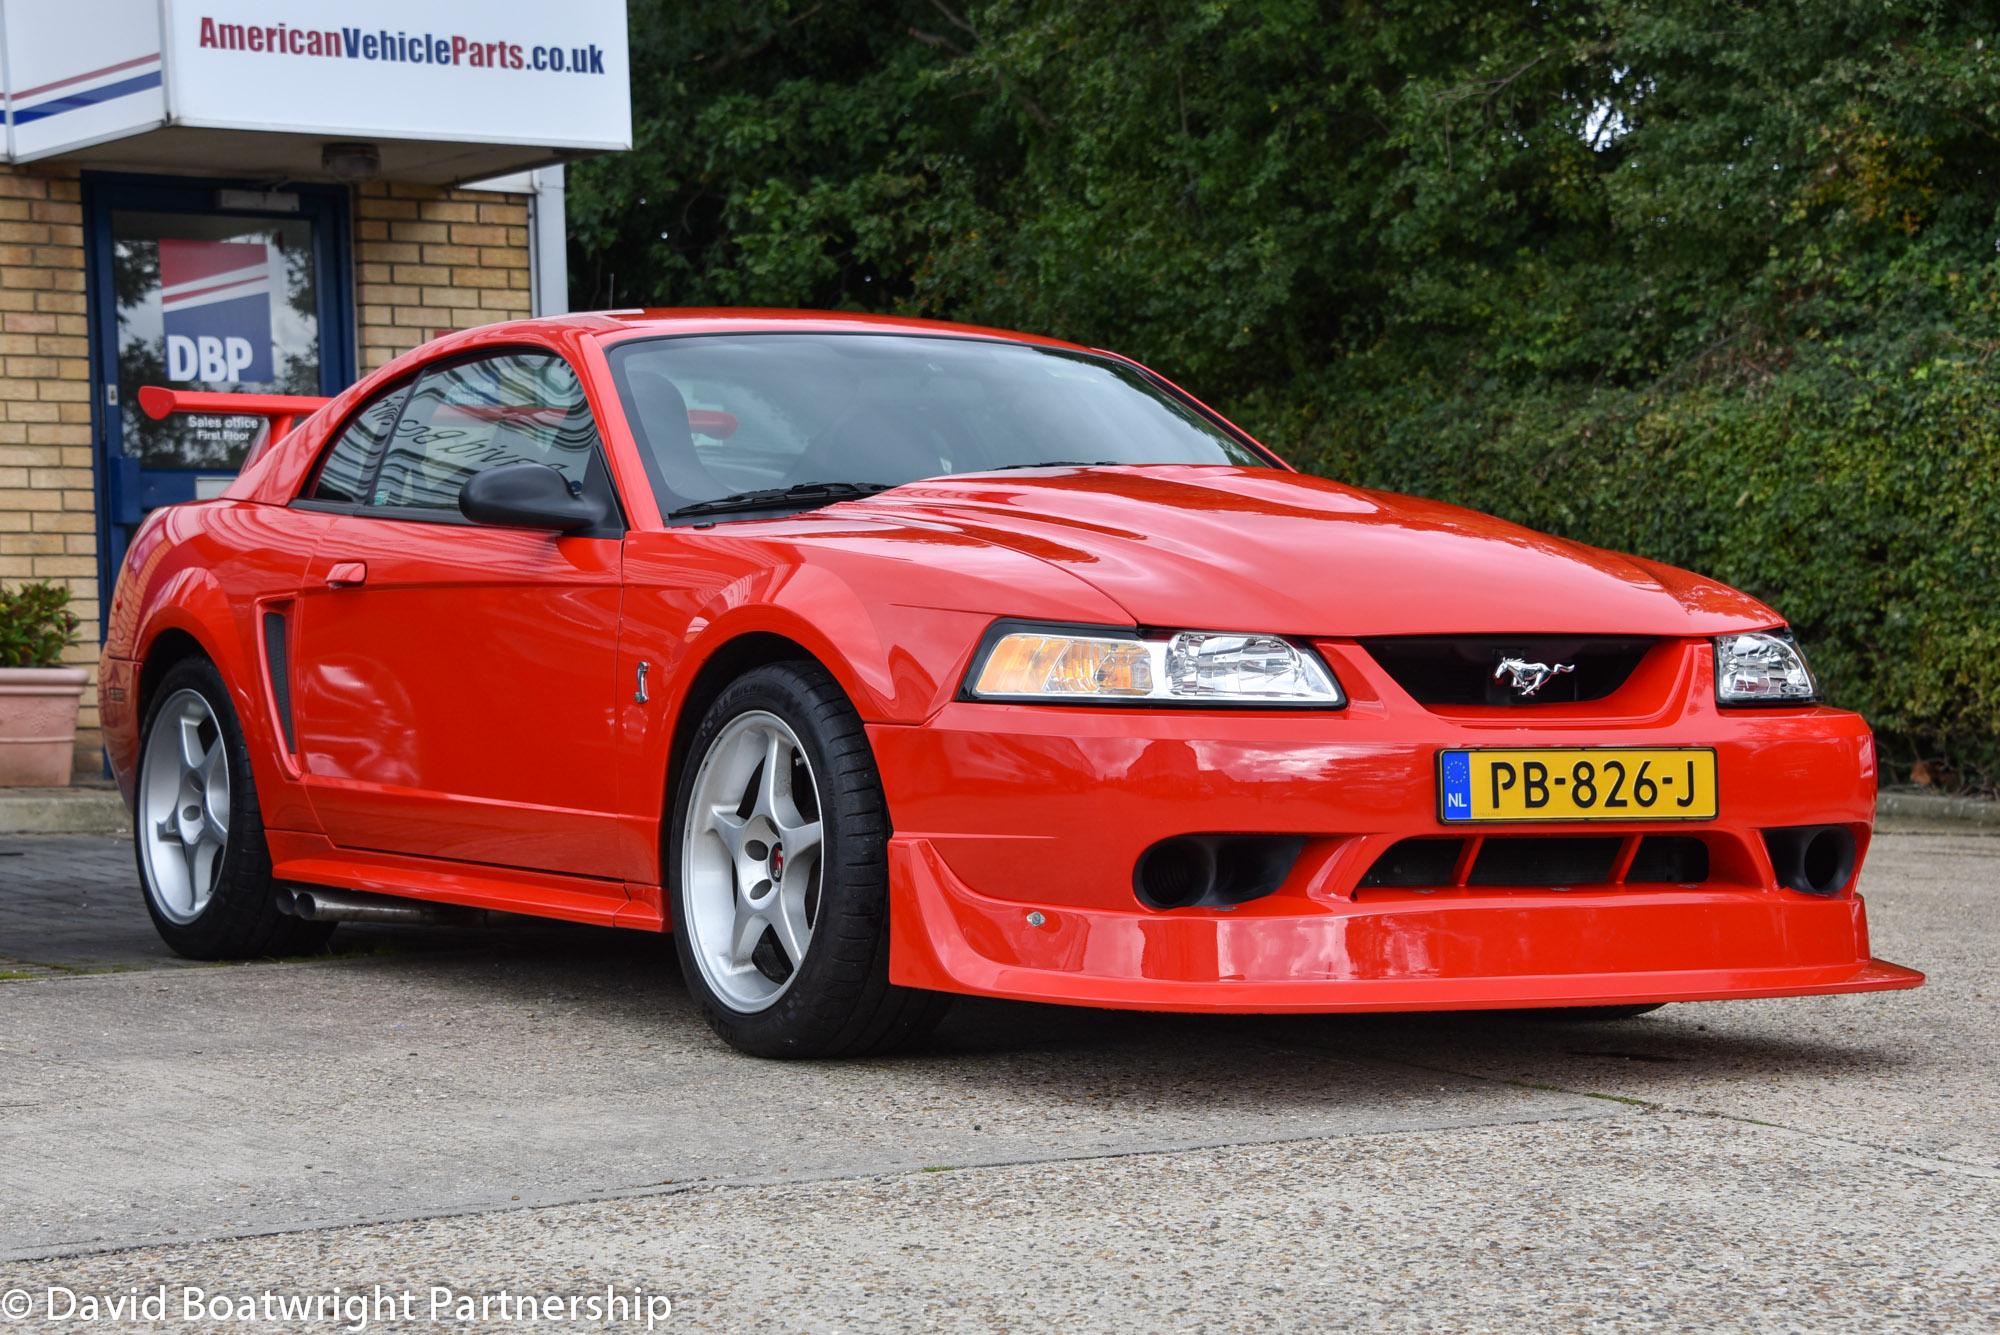 F 150 Cobra >> 2000 Mustang Cobra-R – David Boatwright Partnership | Dodge Ram | F-150 | Challenger